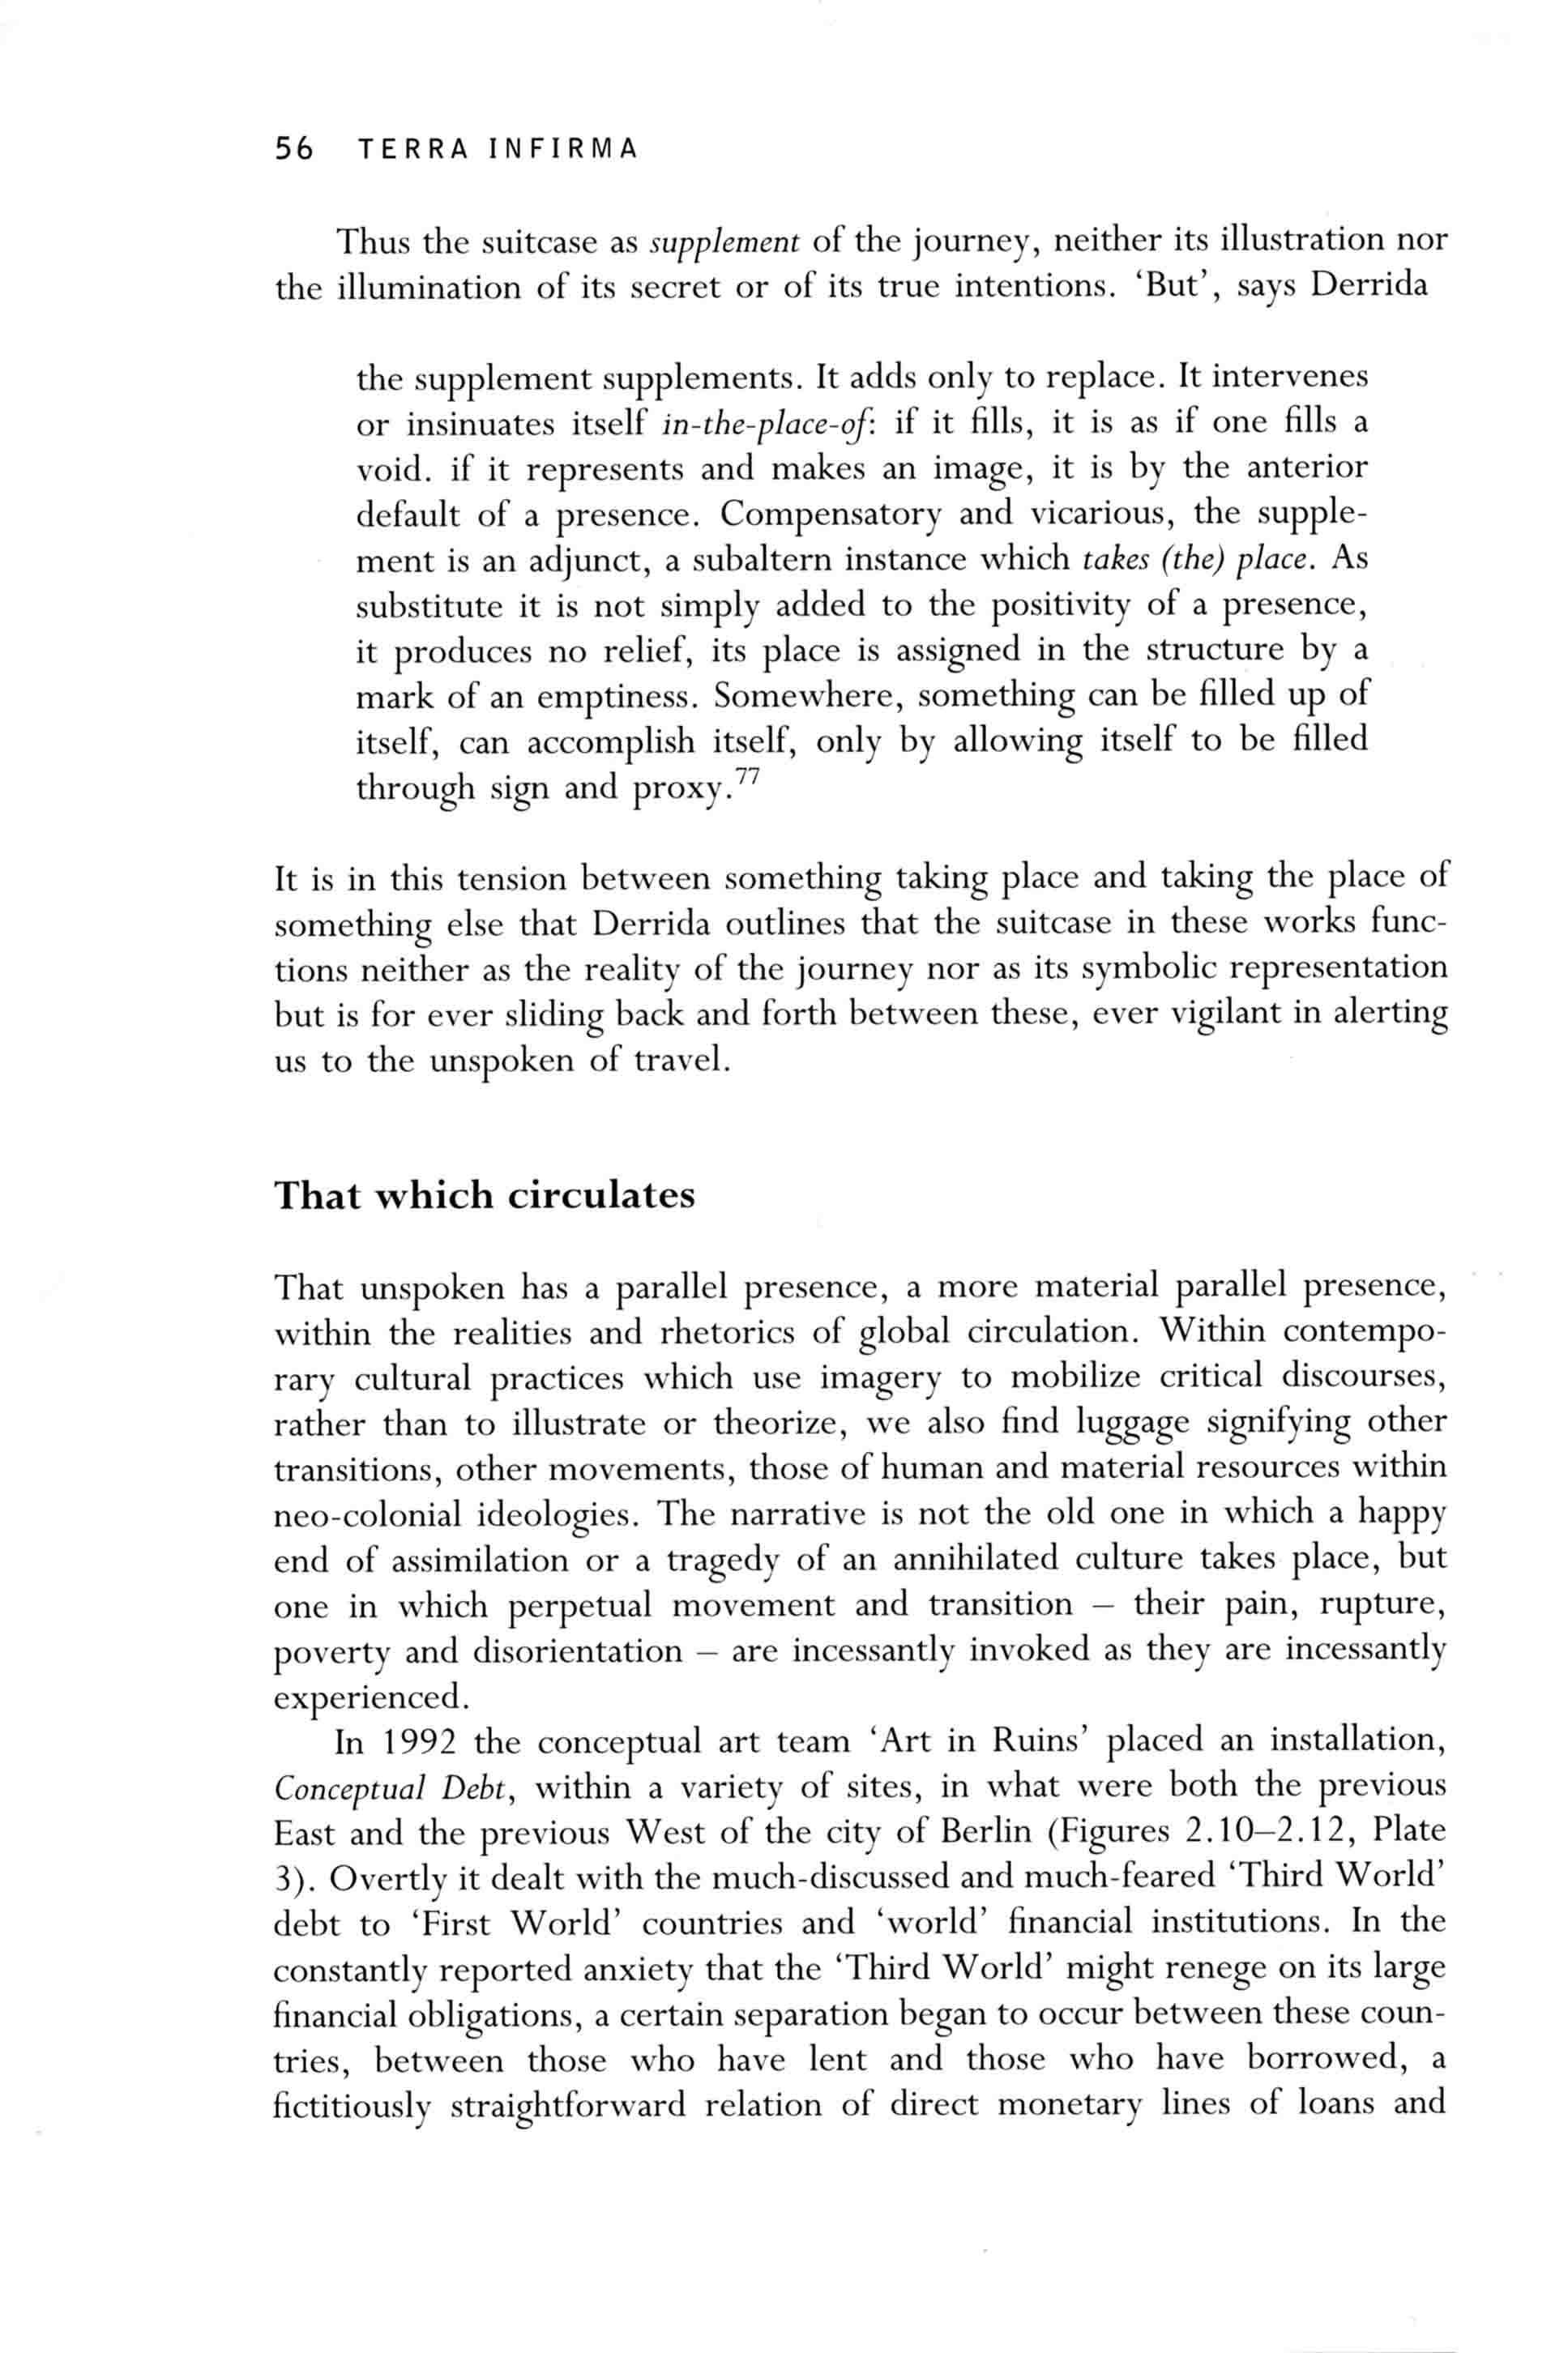 'TERRA INFIRMA: GEOGRAPHY'S VISUAL CULTURE' Irit Rogoff 2000 Routledge  London